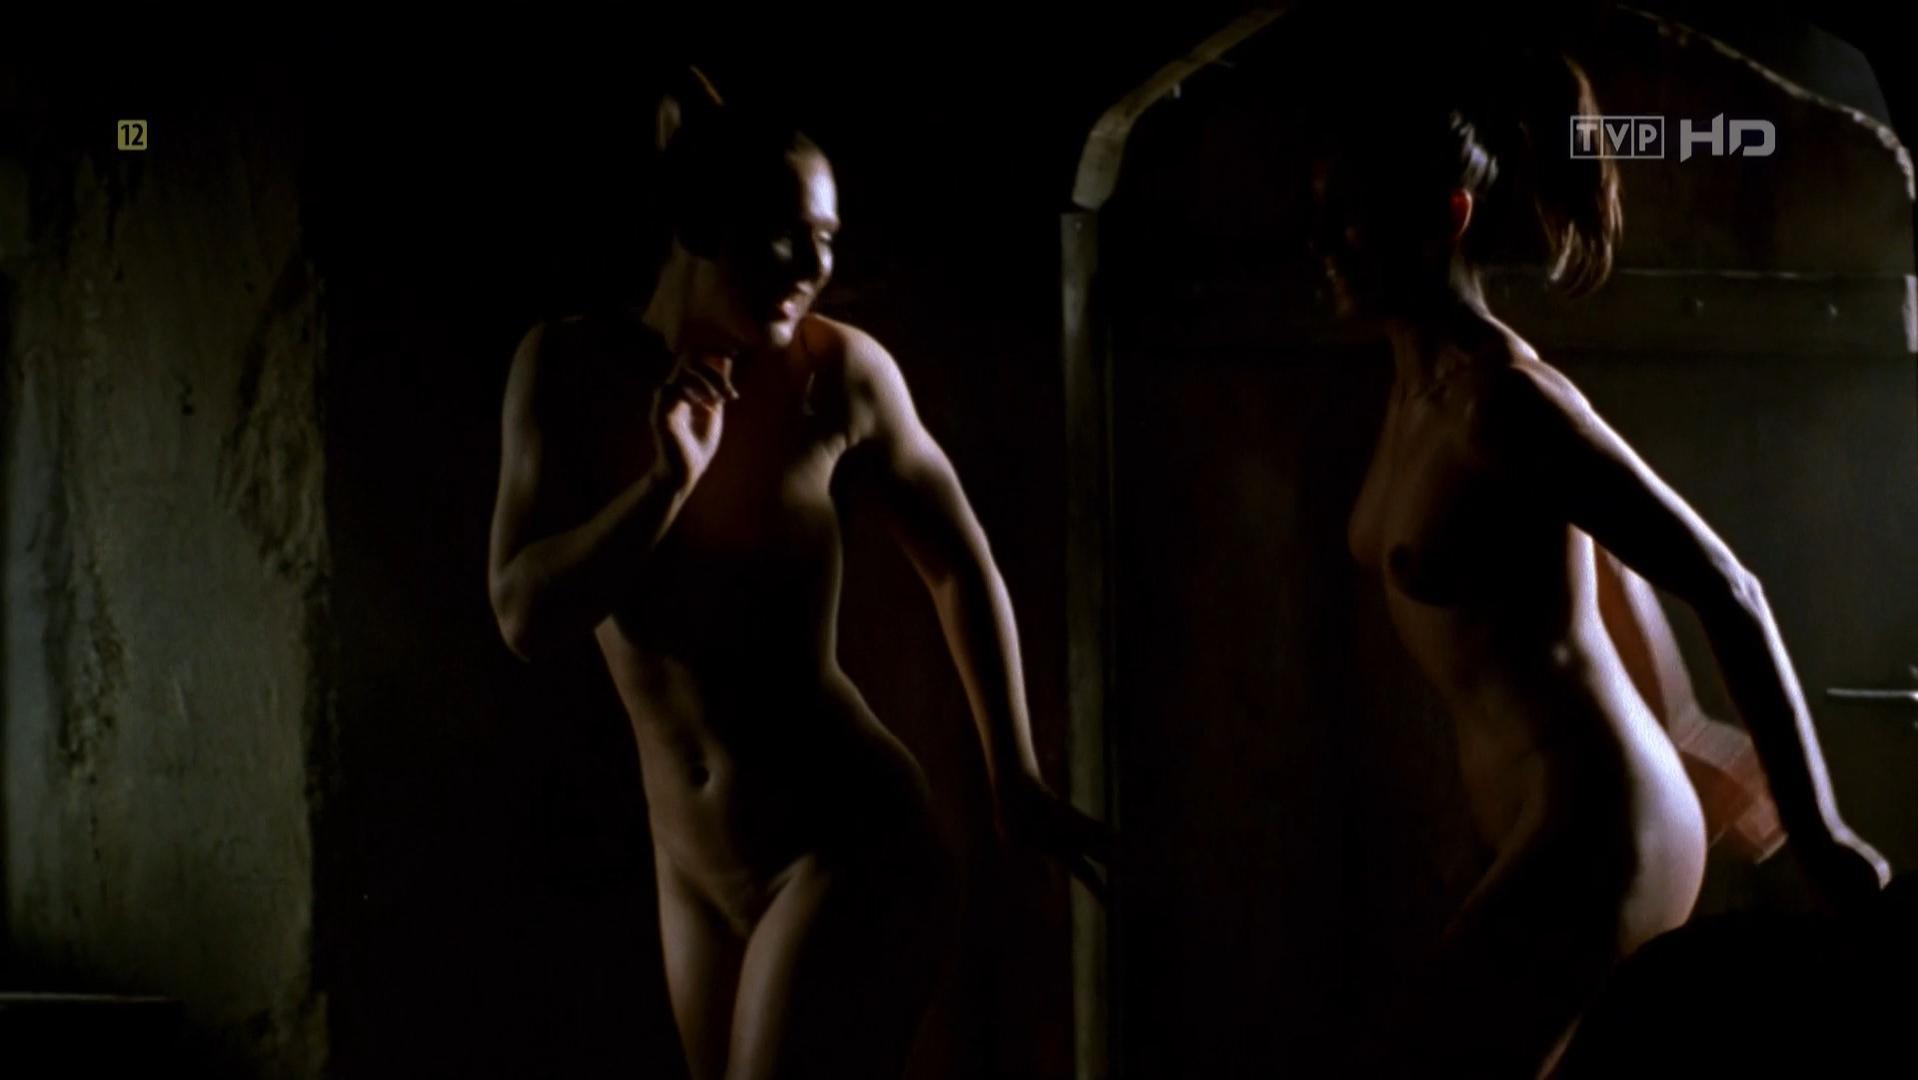 Grazyna Wolszczak nude, Maria Peszek nude, Julita Famulska nude, Malgorzata Zasztowt nude, Joanna Fidler nude - Wiedzmin (2001)